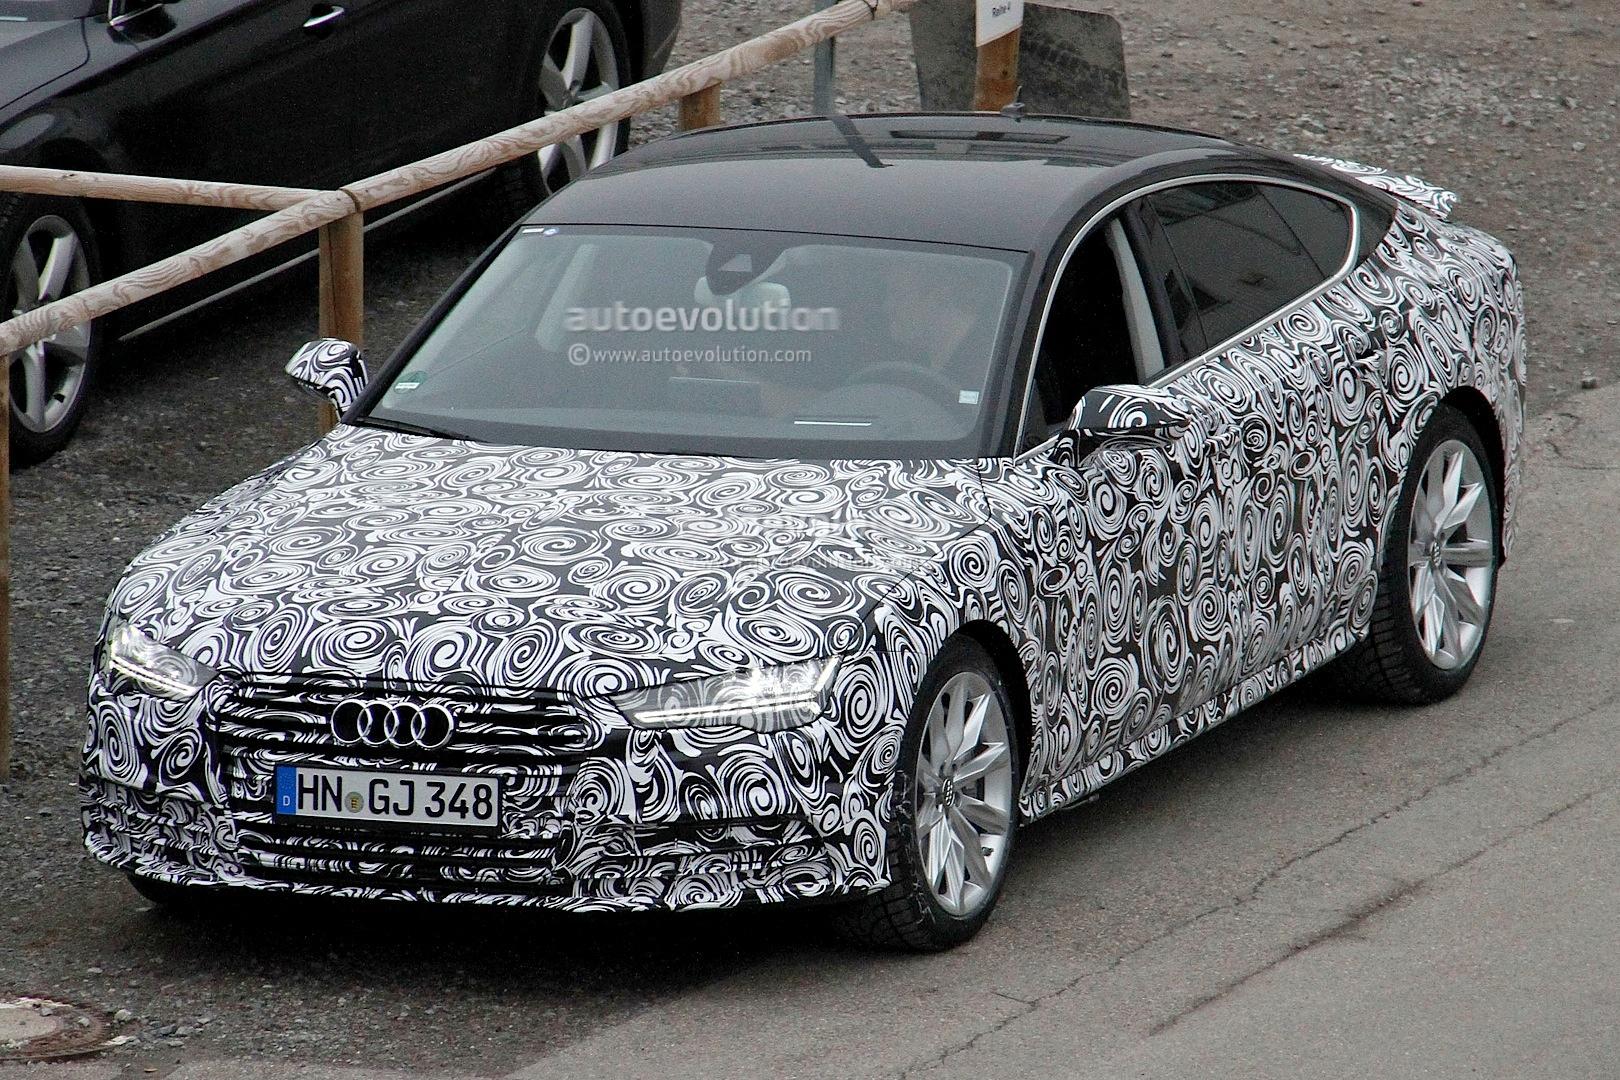 2014 - [Audi] A7 & S7 Sportback Restylée Spyshots-audi-a7-facelift-gets-new-headlight-design-1080p-1